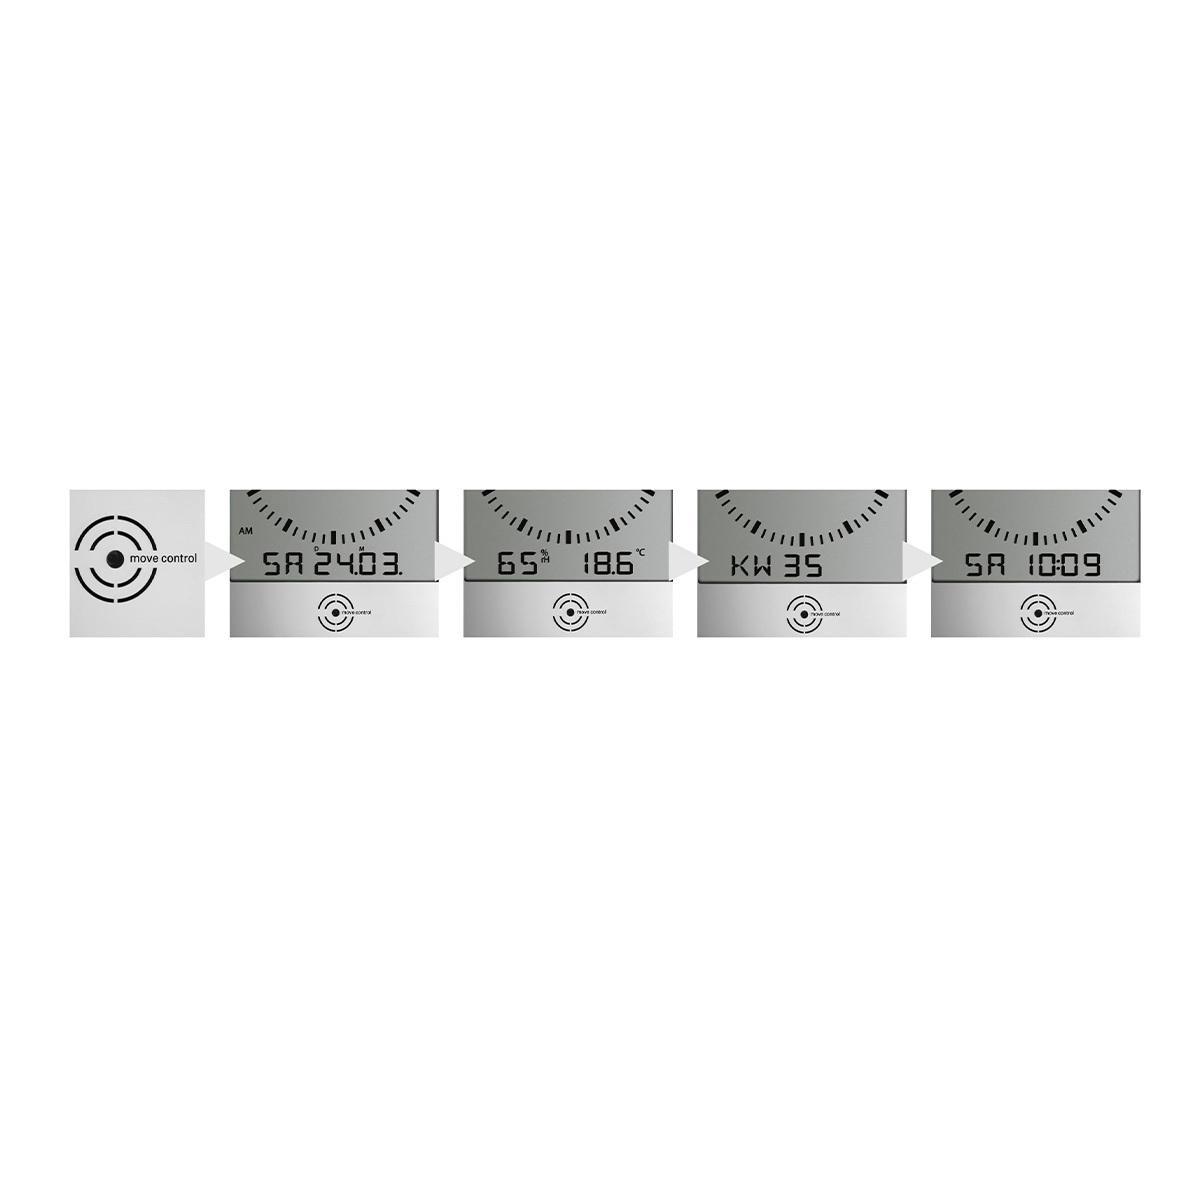 60-4507-digitale-funk-wanduhr-mit-analogem-zifferblatt-raumklima-datum-ansicht1-1200x1200px.jpg